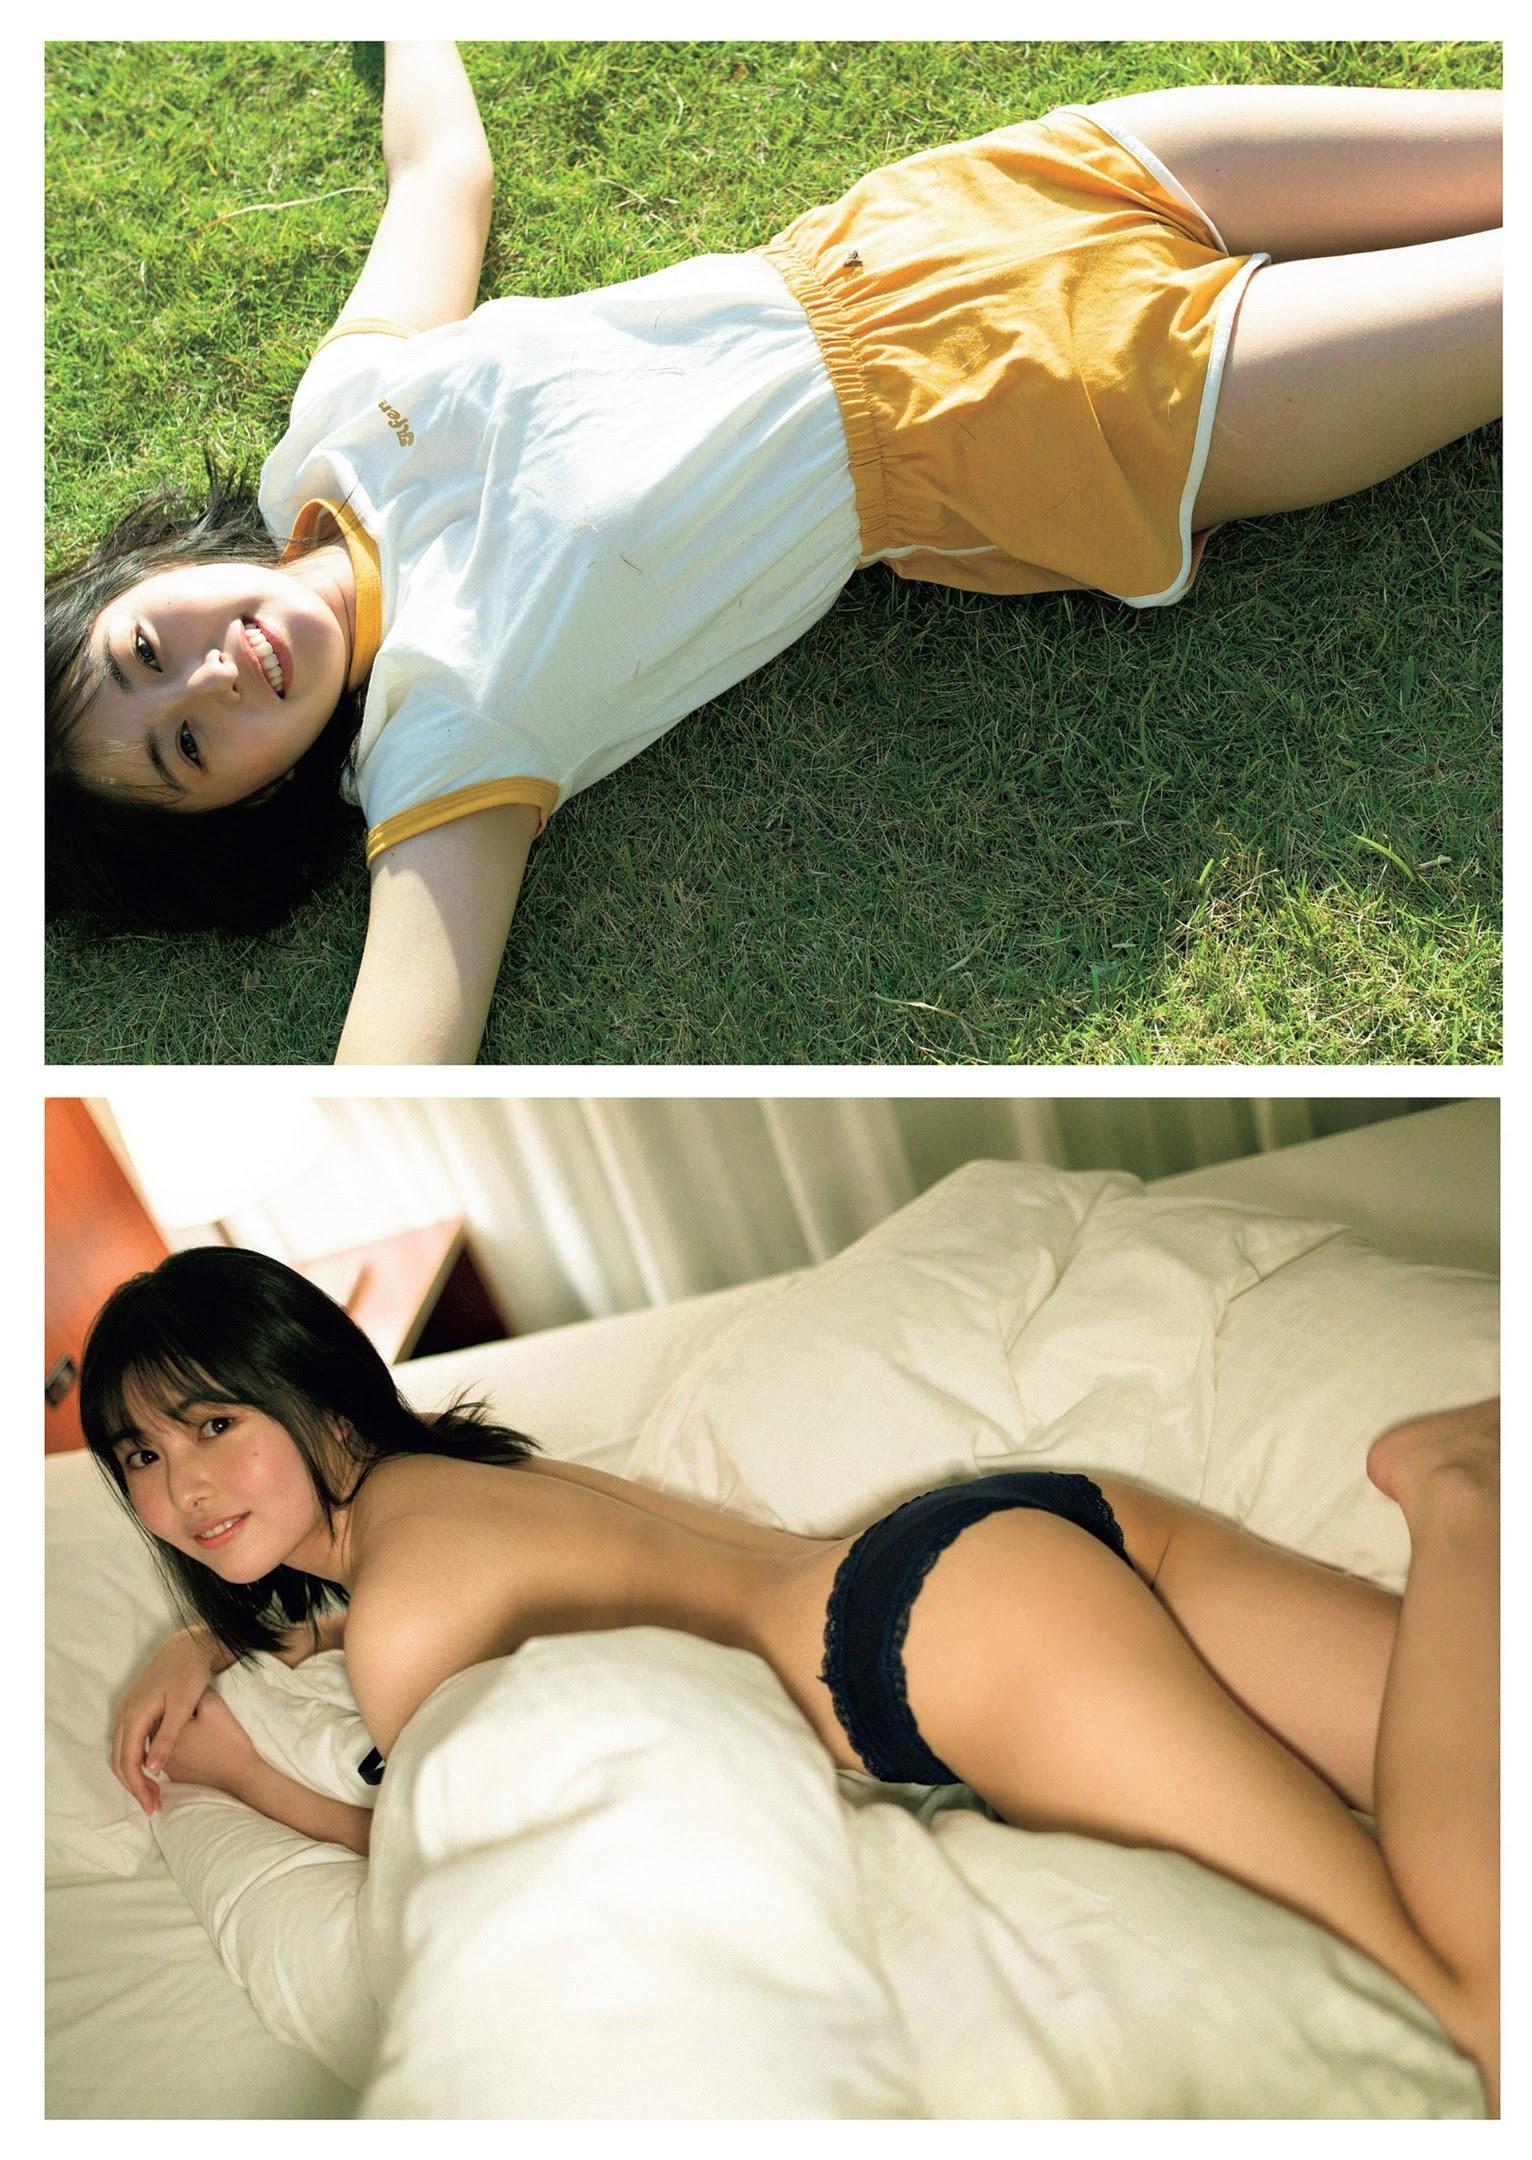 小山璃奈 頓知気さきな 伊藤美来-Weekly Playboy 2021年第十八期 高清套图 第25张